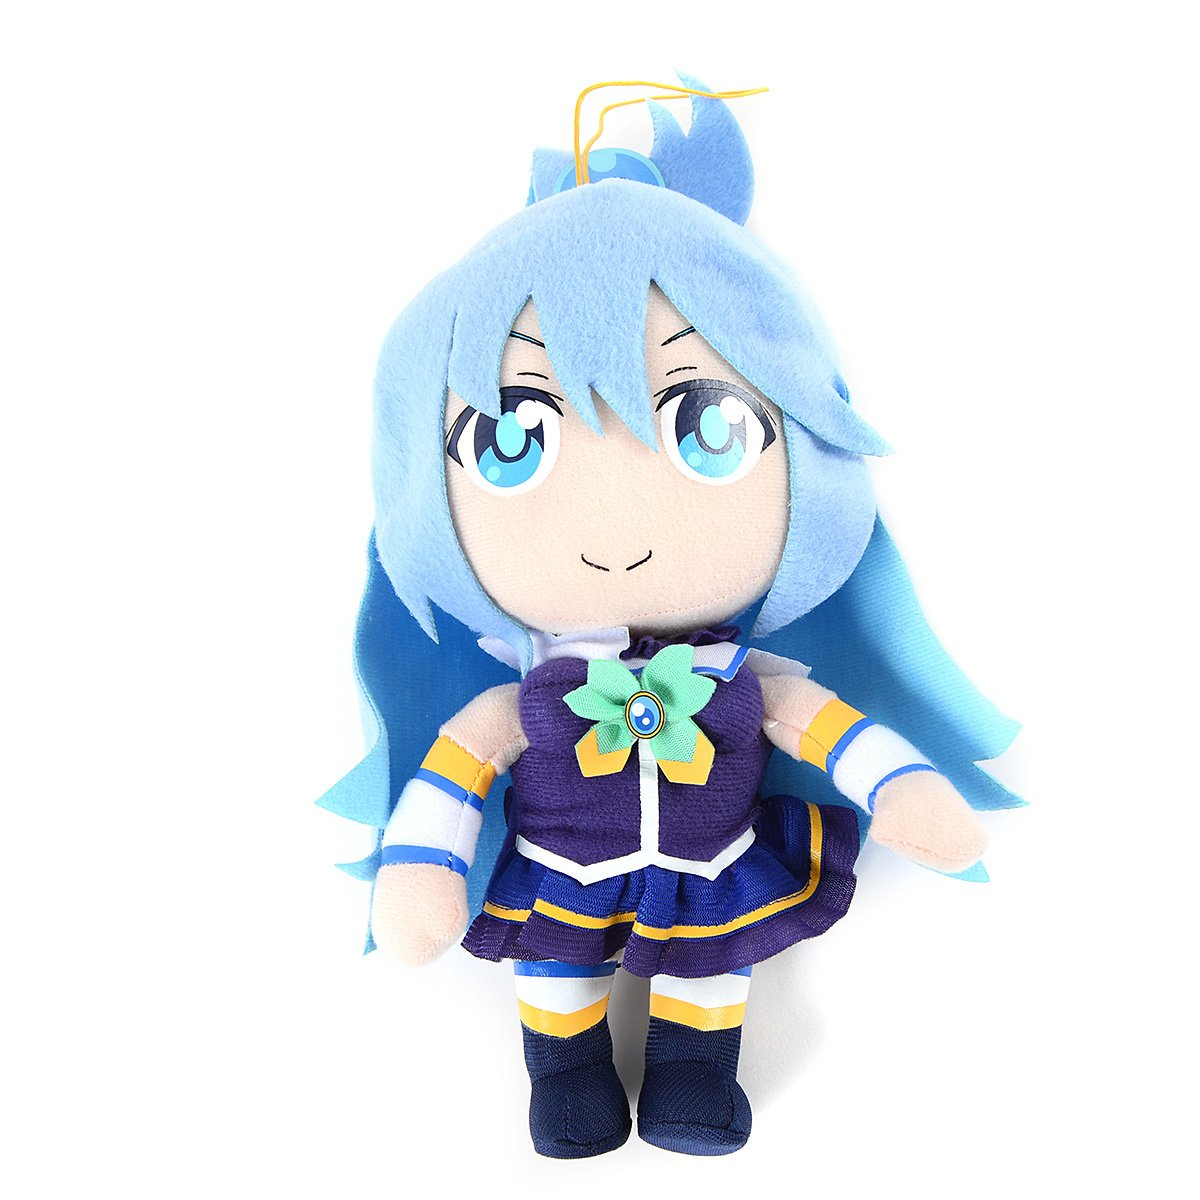 Anime Plushies